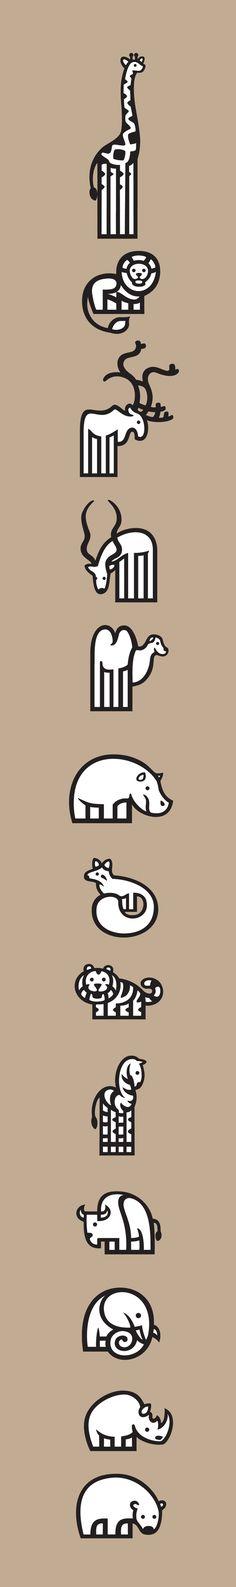 Pictograms - ZOO by Jorge Dias, via Behance #grafica #illustrazione #animali